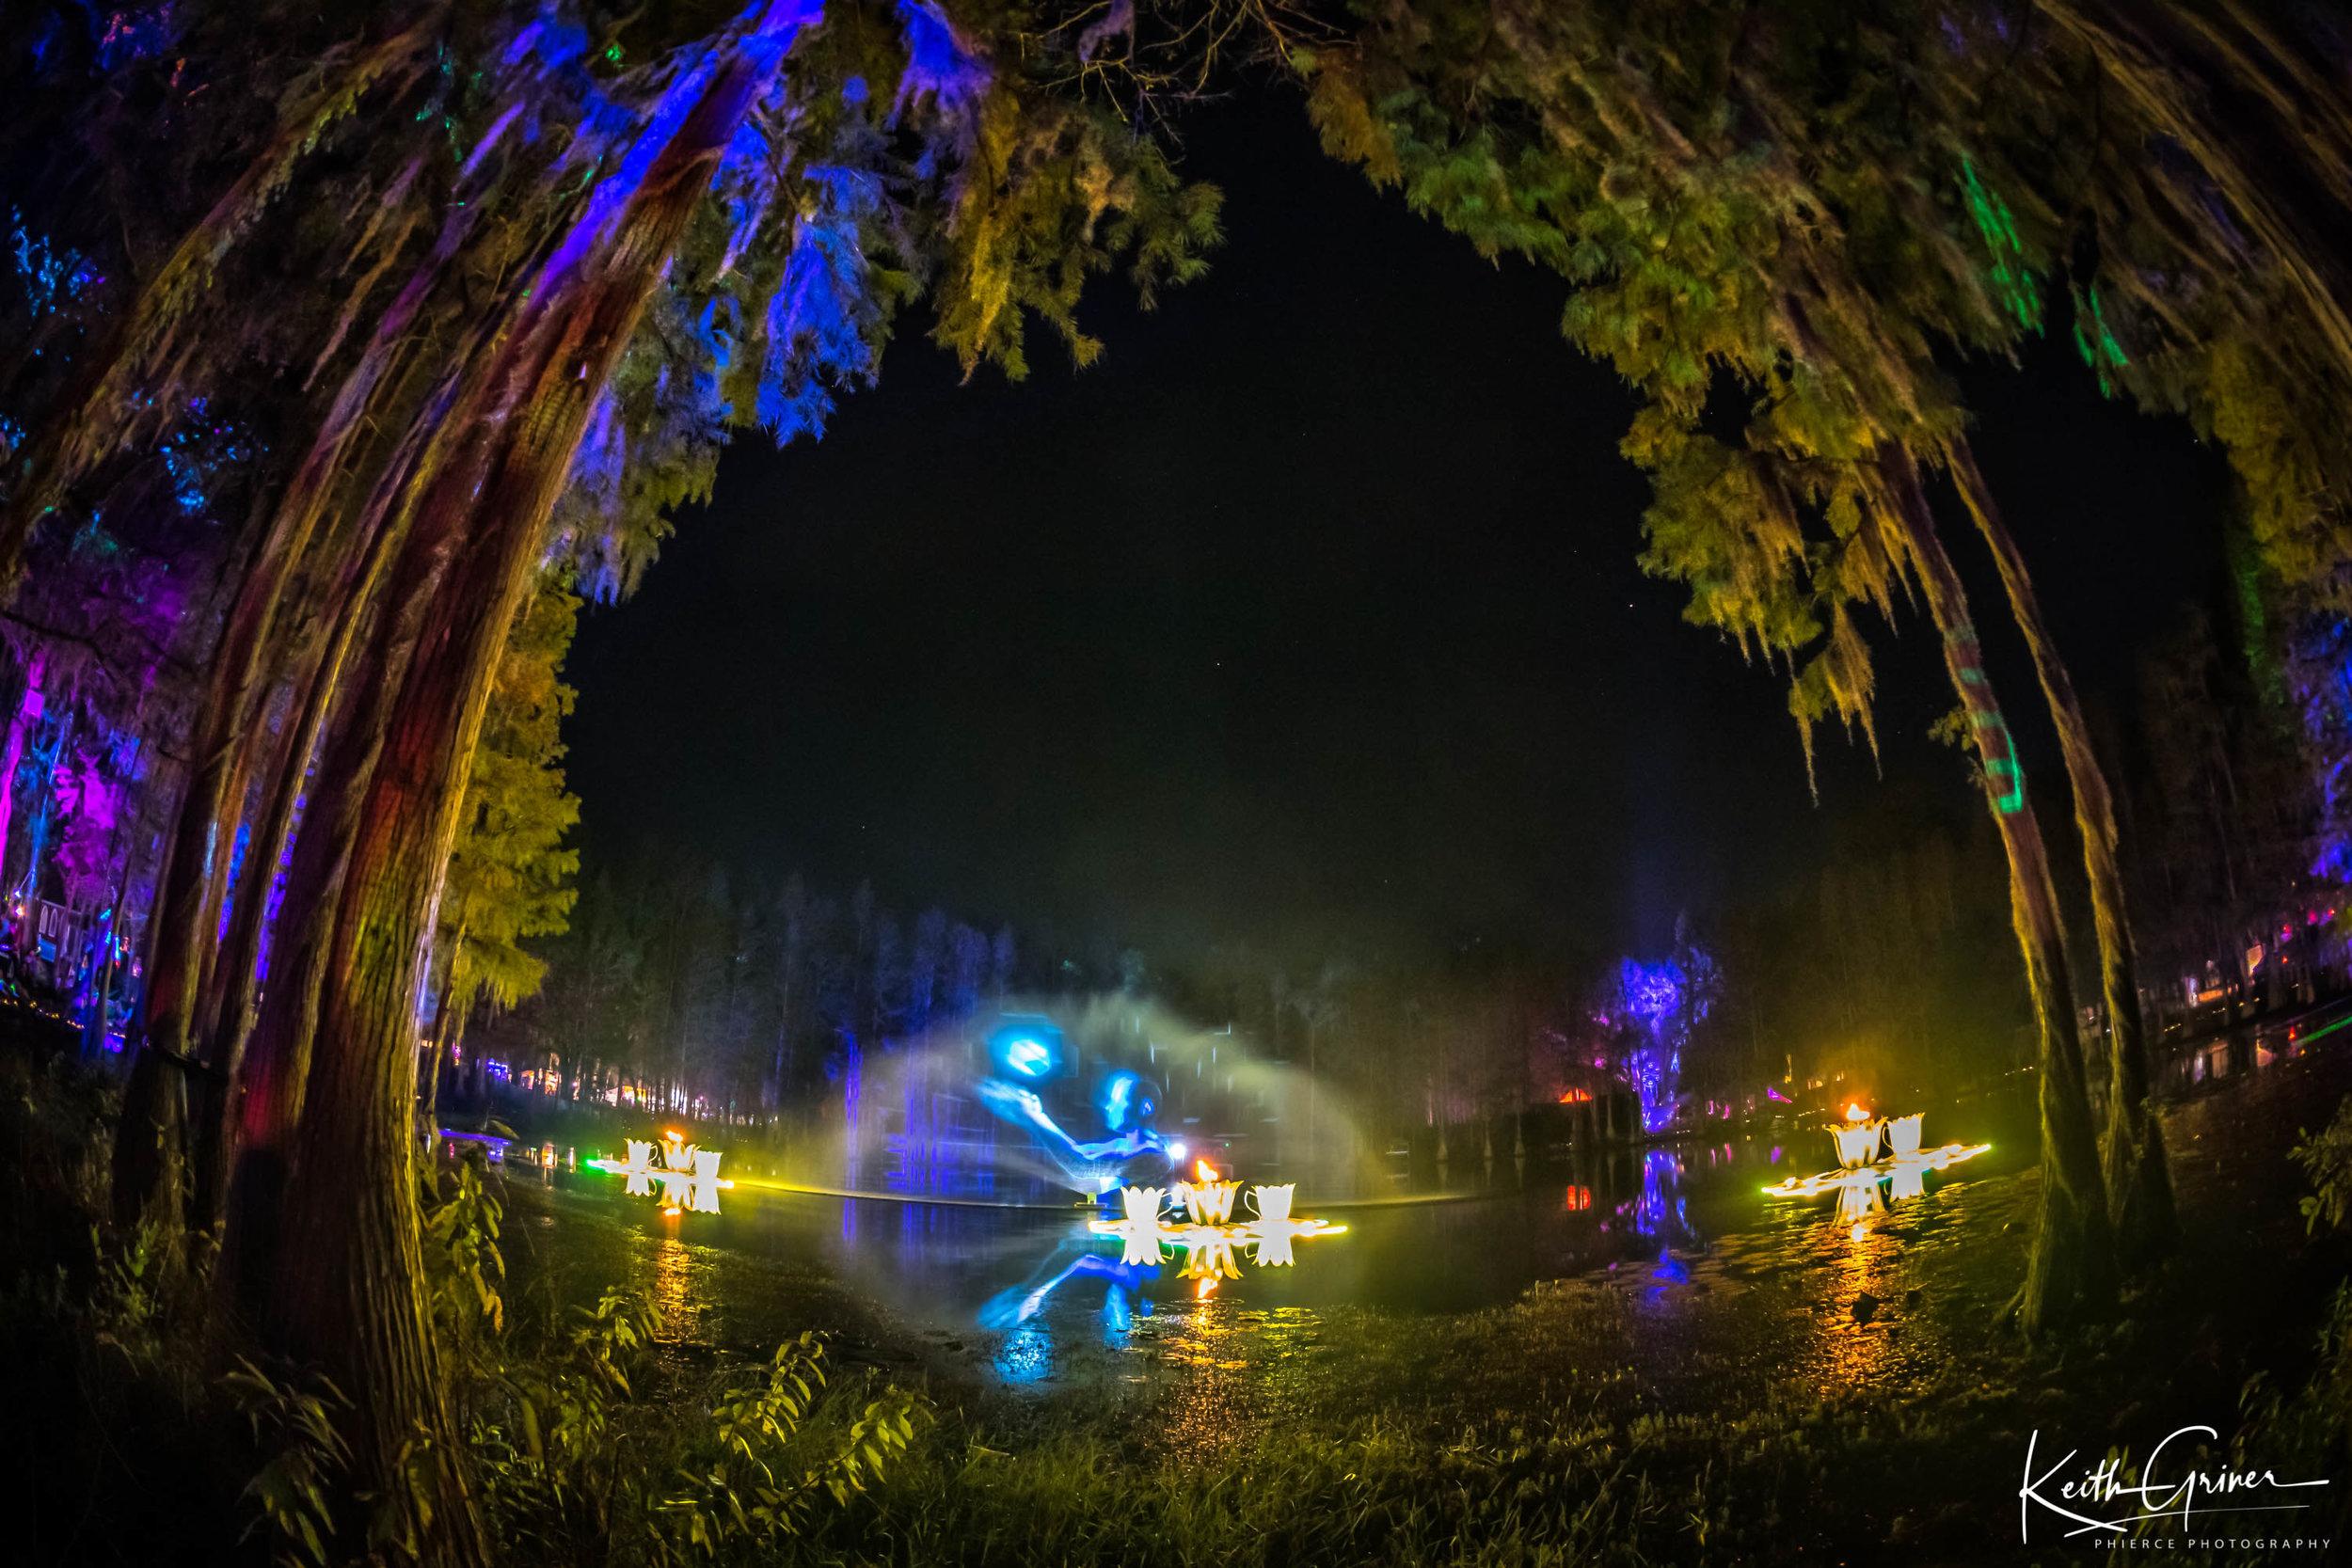 Hula_Spirit Lake_by Keith Griner 0D5_3102-Edit.jpg